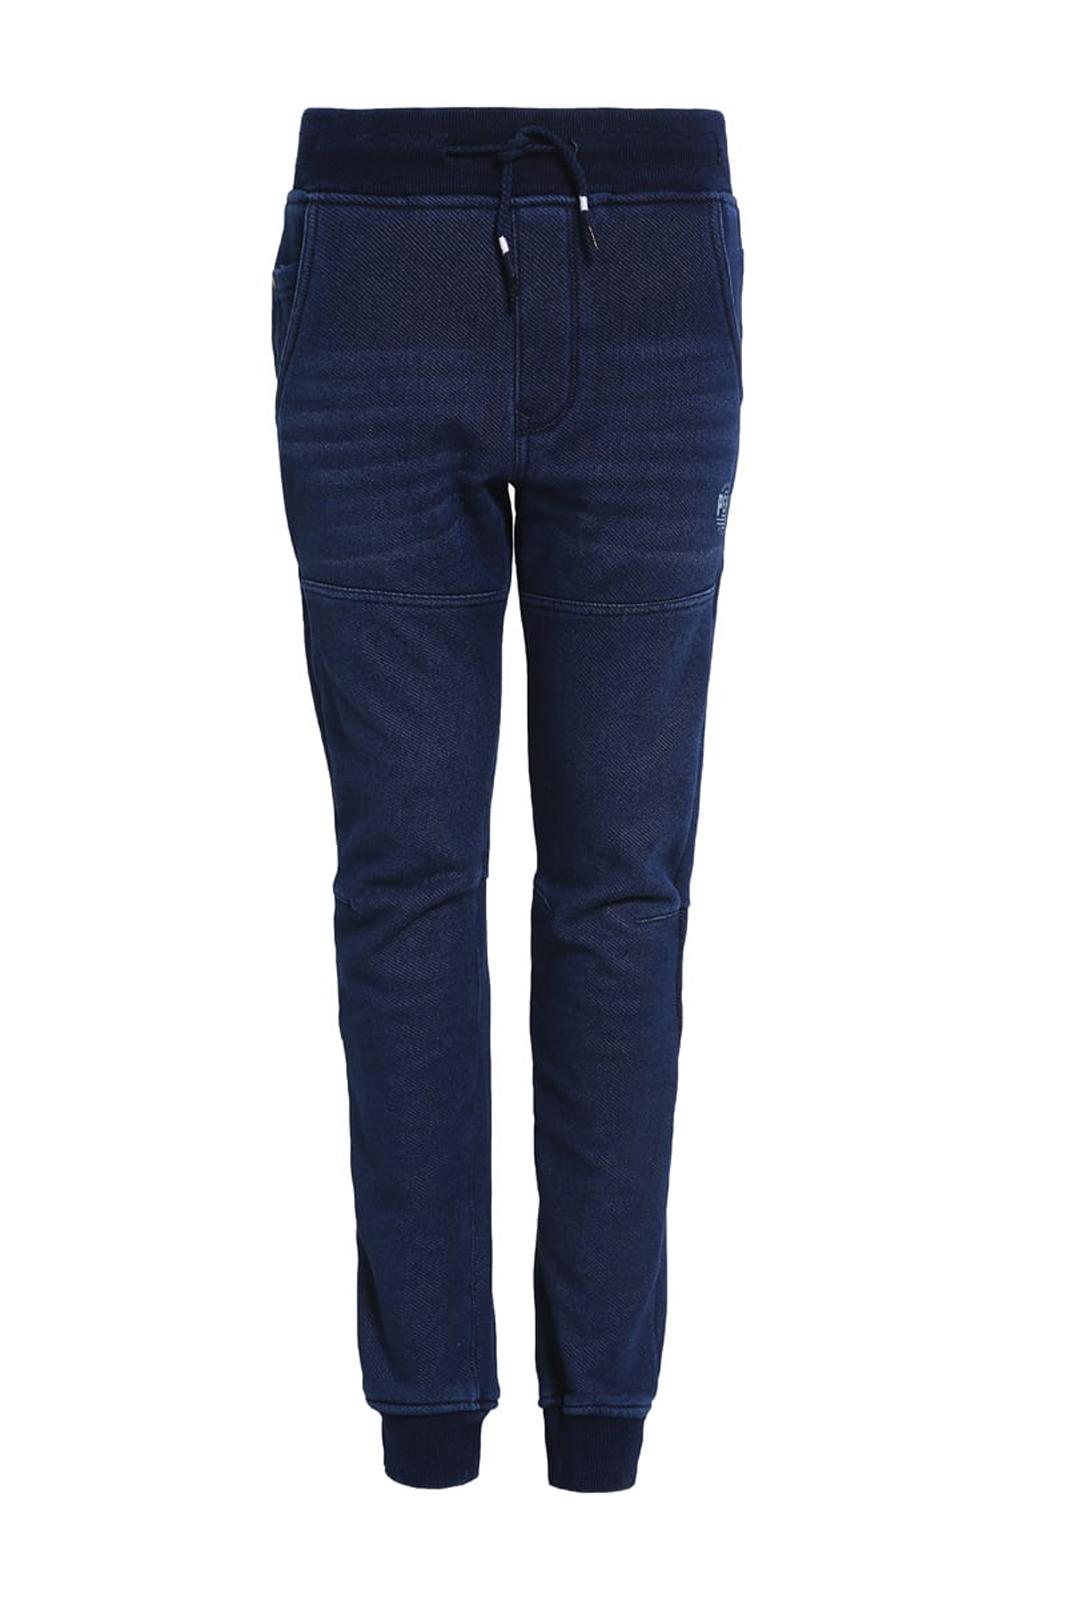 Bas  Pepe jeans PB200551 ferry bleu